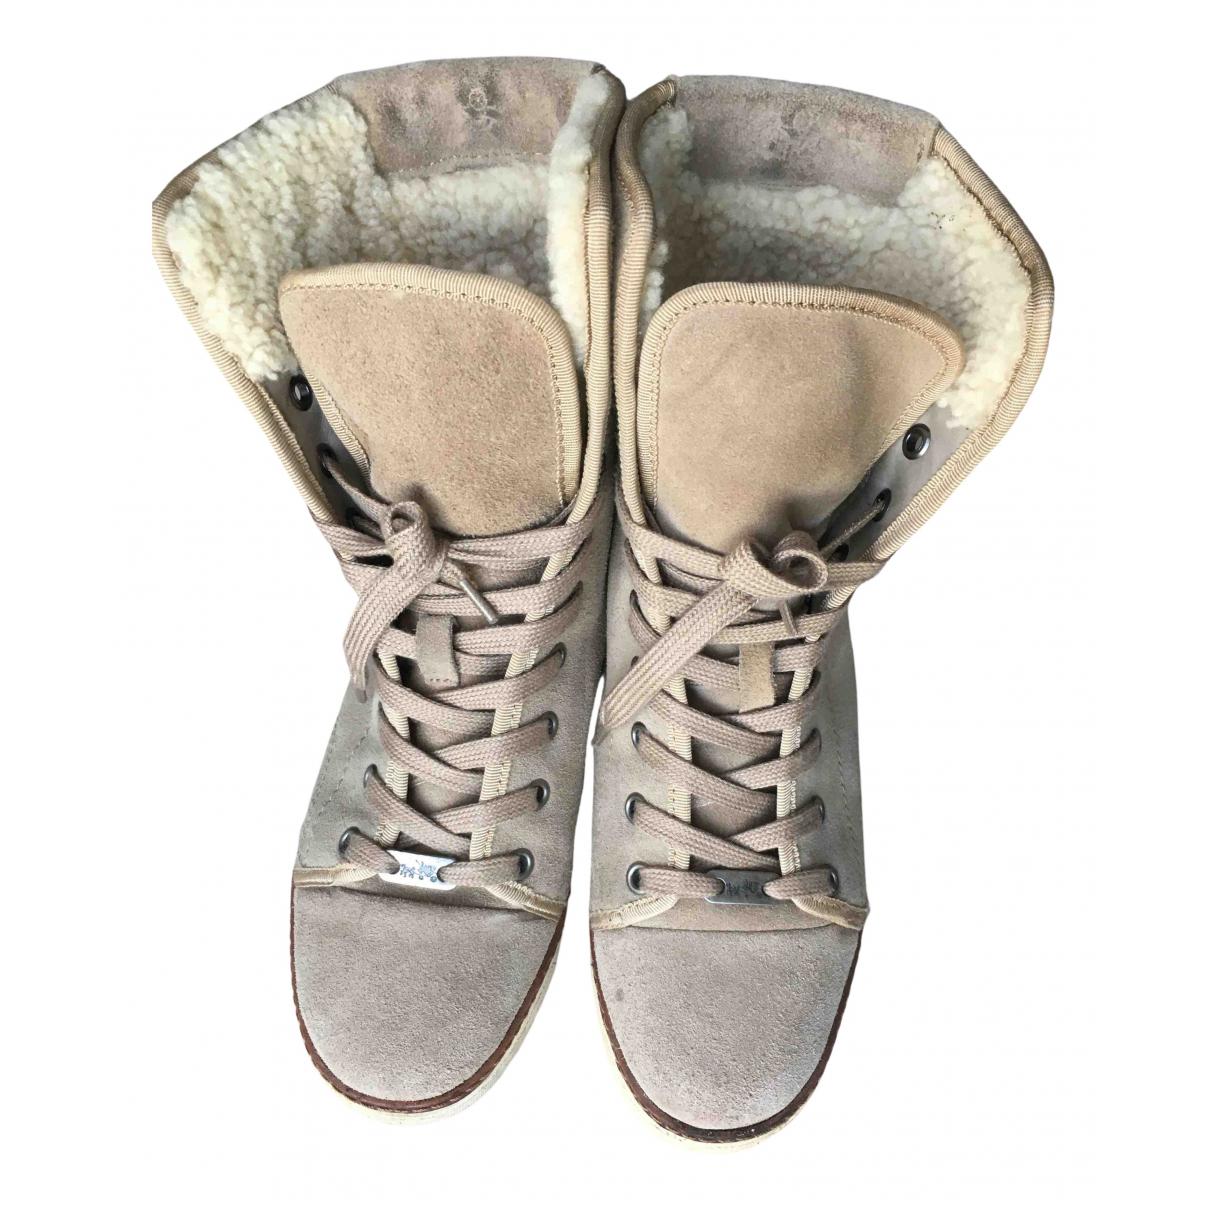 Coach N Beige Shearling Ankle boots for Women 36 EU